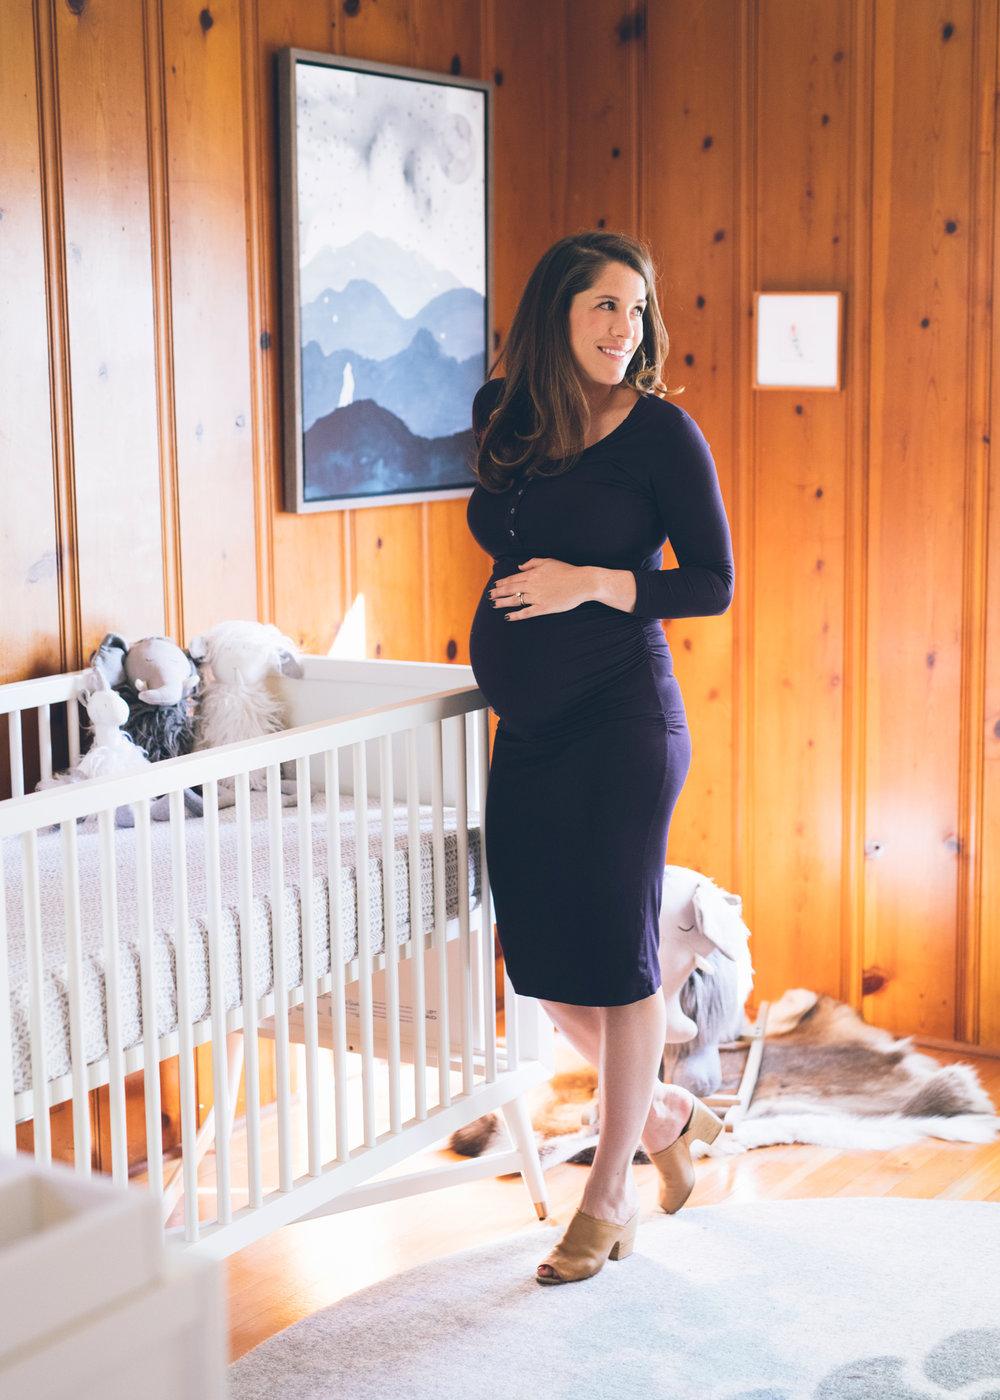 pregnant-woman-standing-near-a-crib-in-mid-century-modern-nursery.jpg